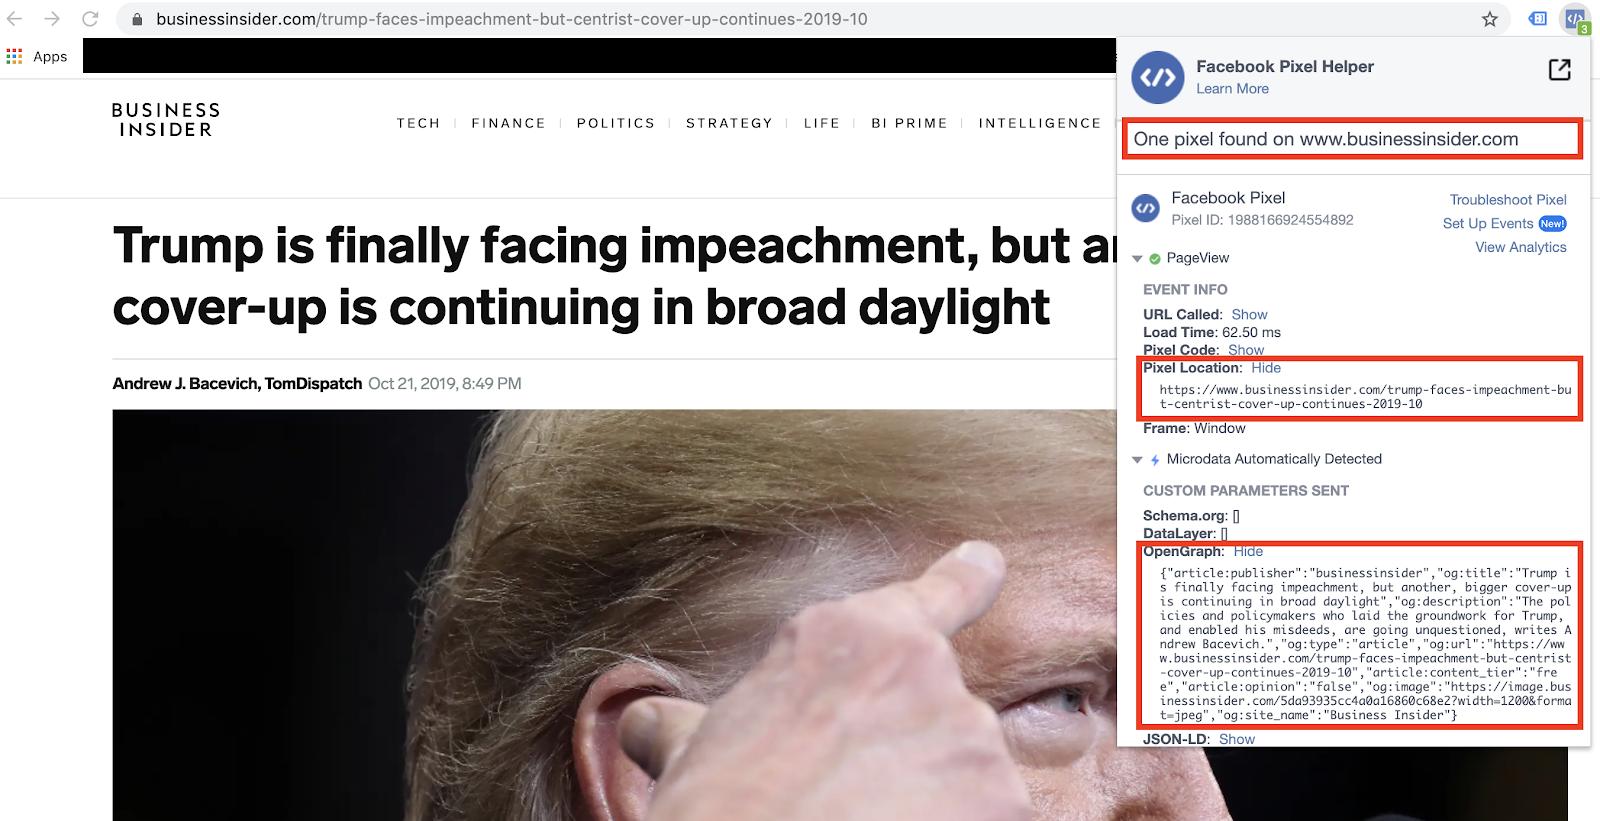 Facebook pixel data inside an article on Business Insider